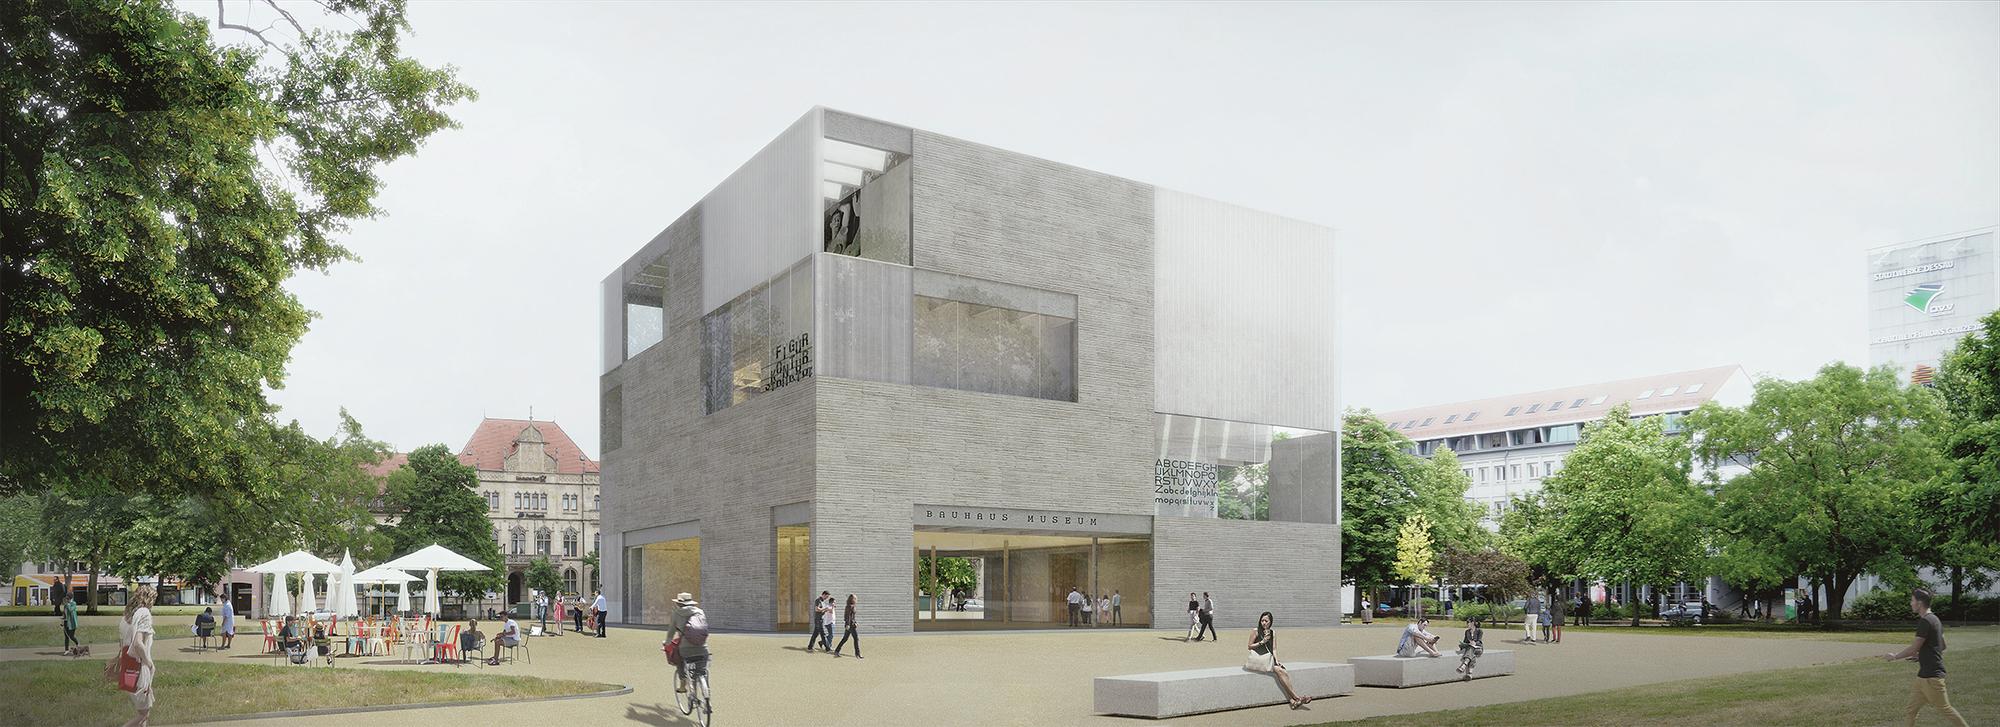 Gallery of foundation bauhaus dessau announces winners of - Bauhaus architektur merkmale ...